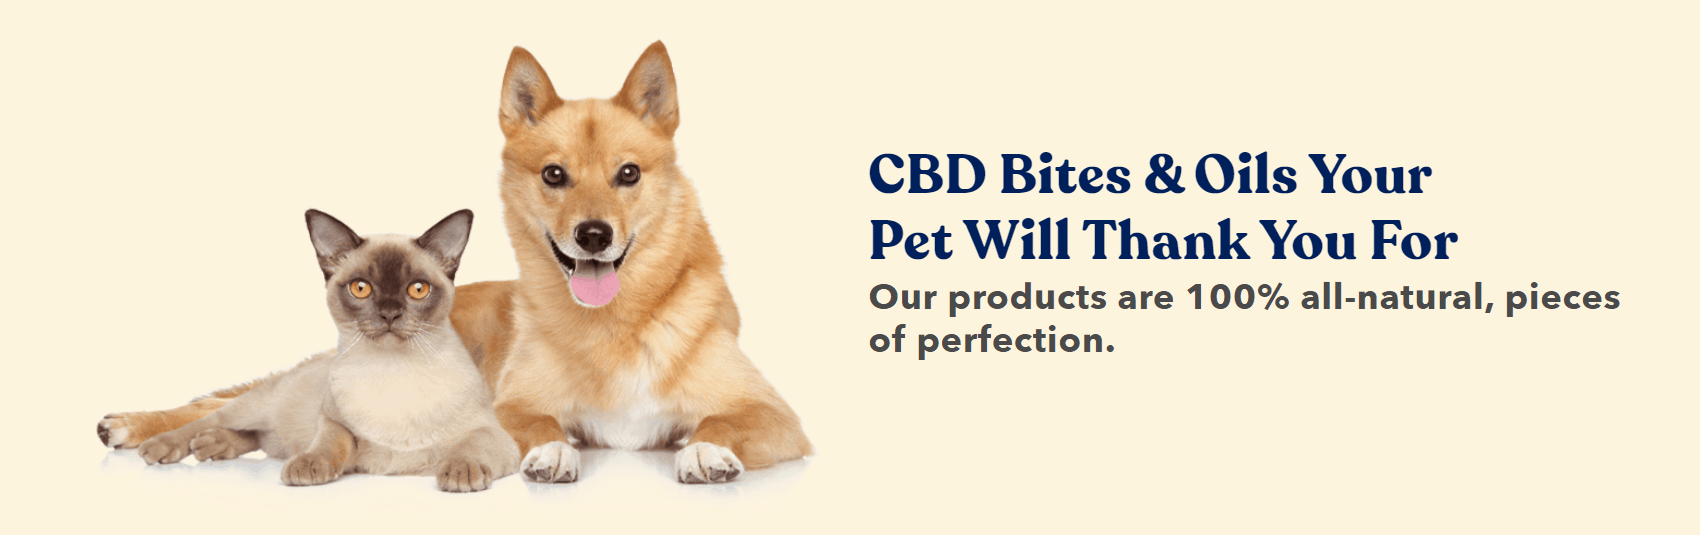 Honest Paws CBD Coupons Pet Friendly Products